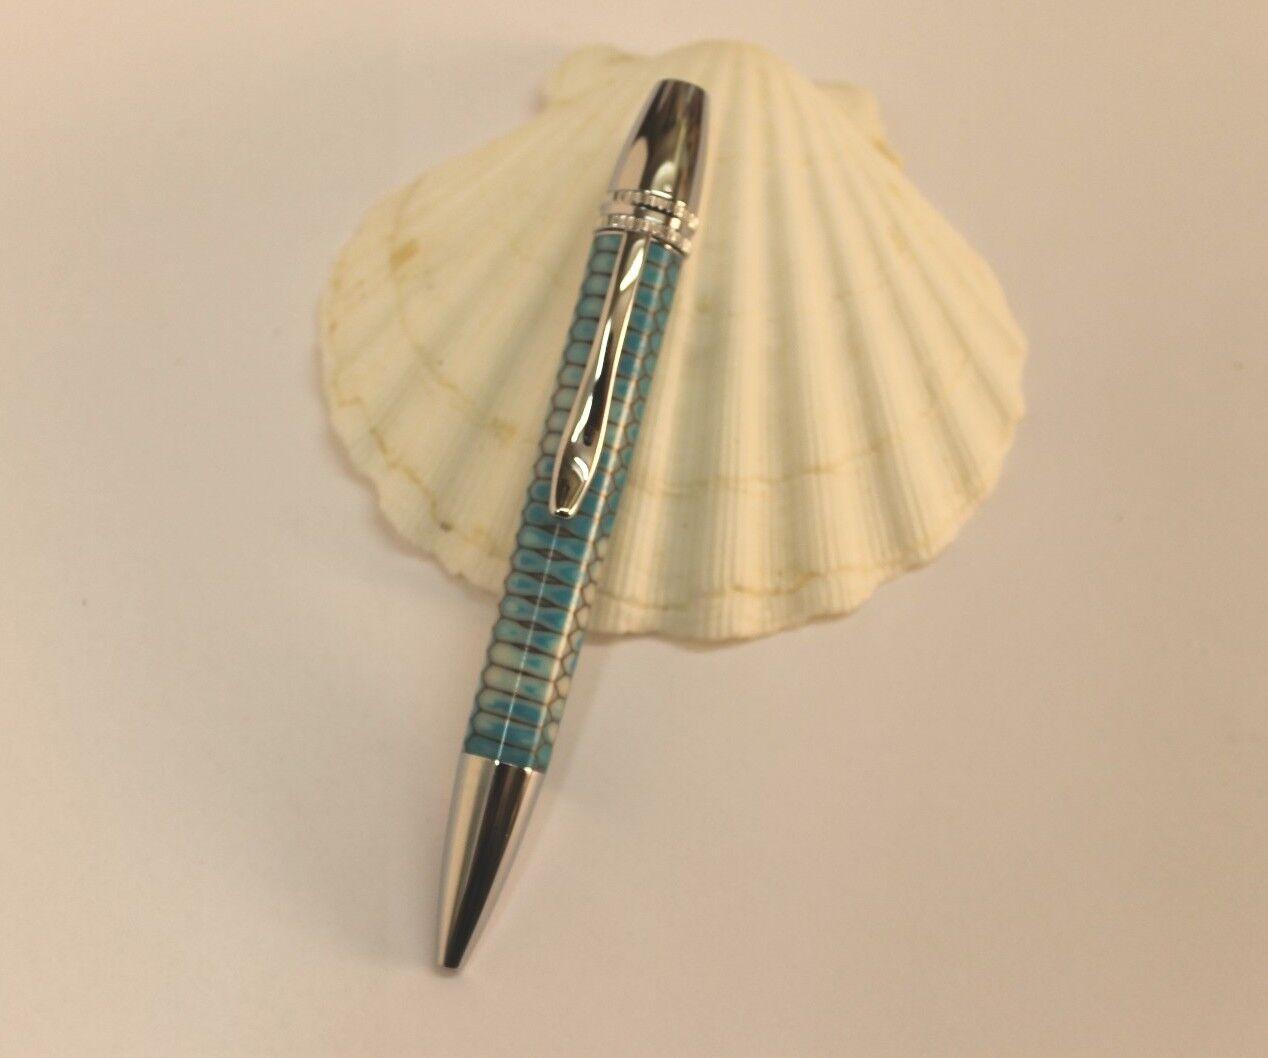 Kugelschreiber, Drehkugelschreiber, Imker, Wabendesign, Unikat, handgedrechselt       Guter Markt  02867c